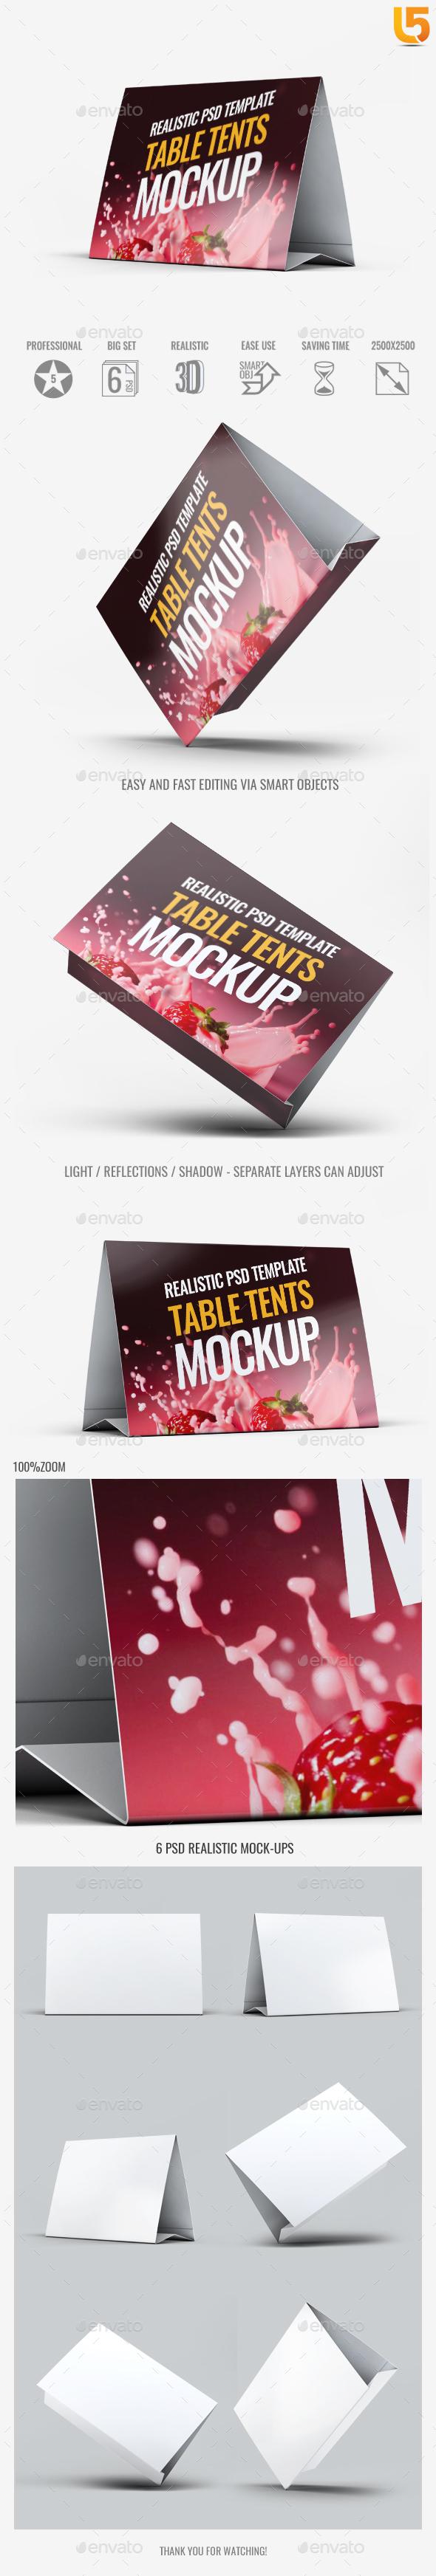 Table Tents Mock-Up V.2 - Print Product Mock-Ups